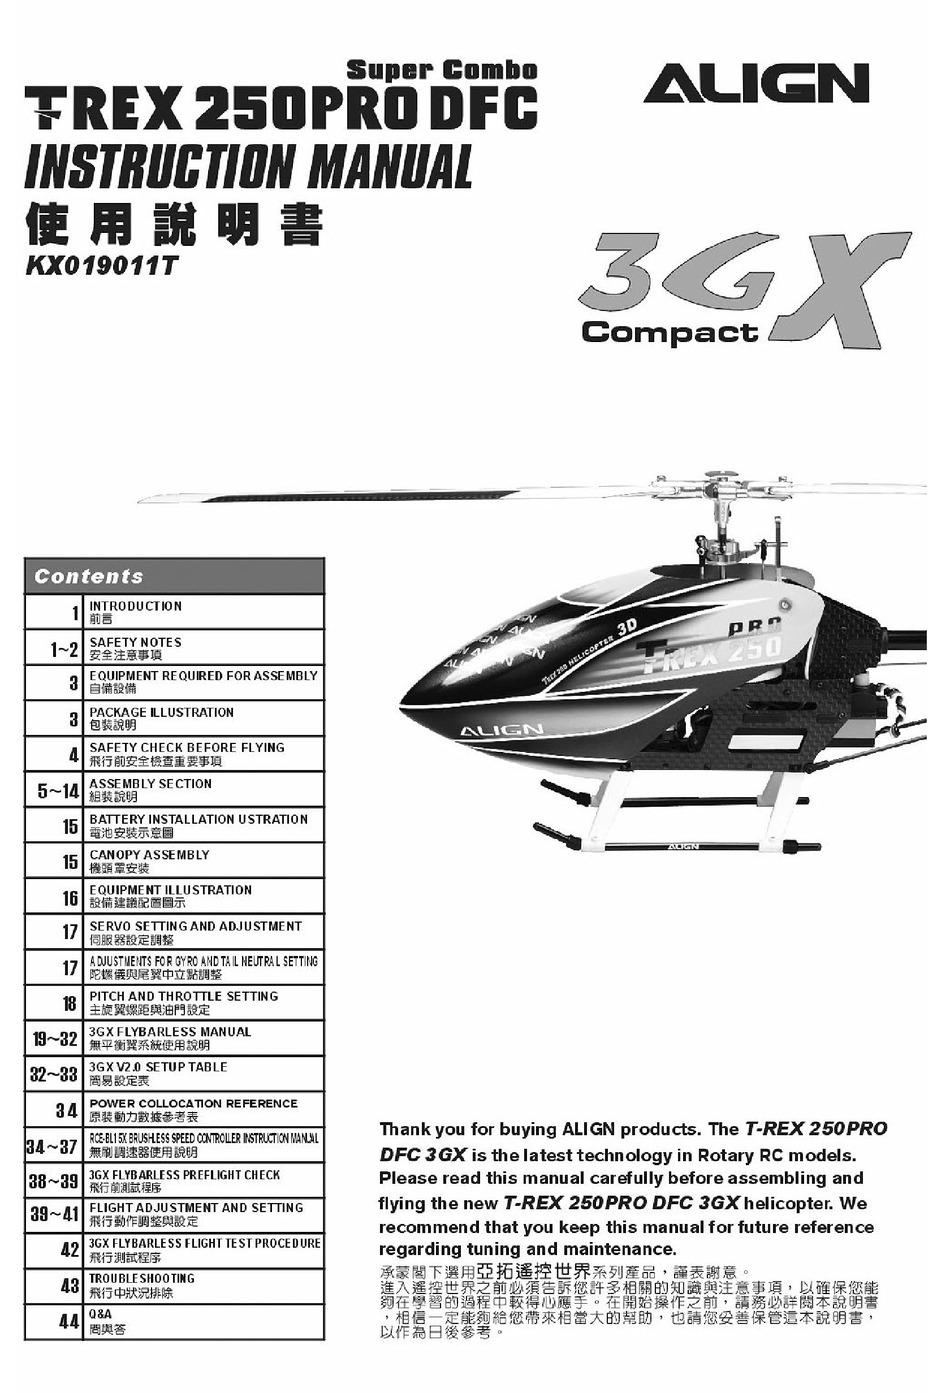 ALIGN T-REX 250PRO DFC KX019011T INSTRUCTION MANUAL Pdf